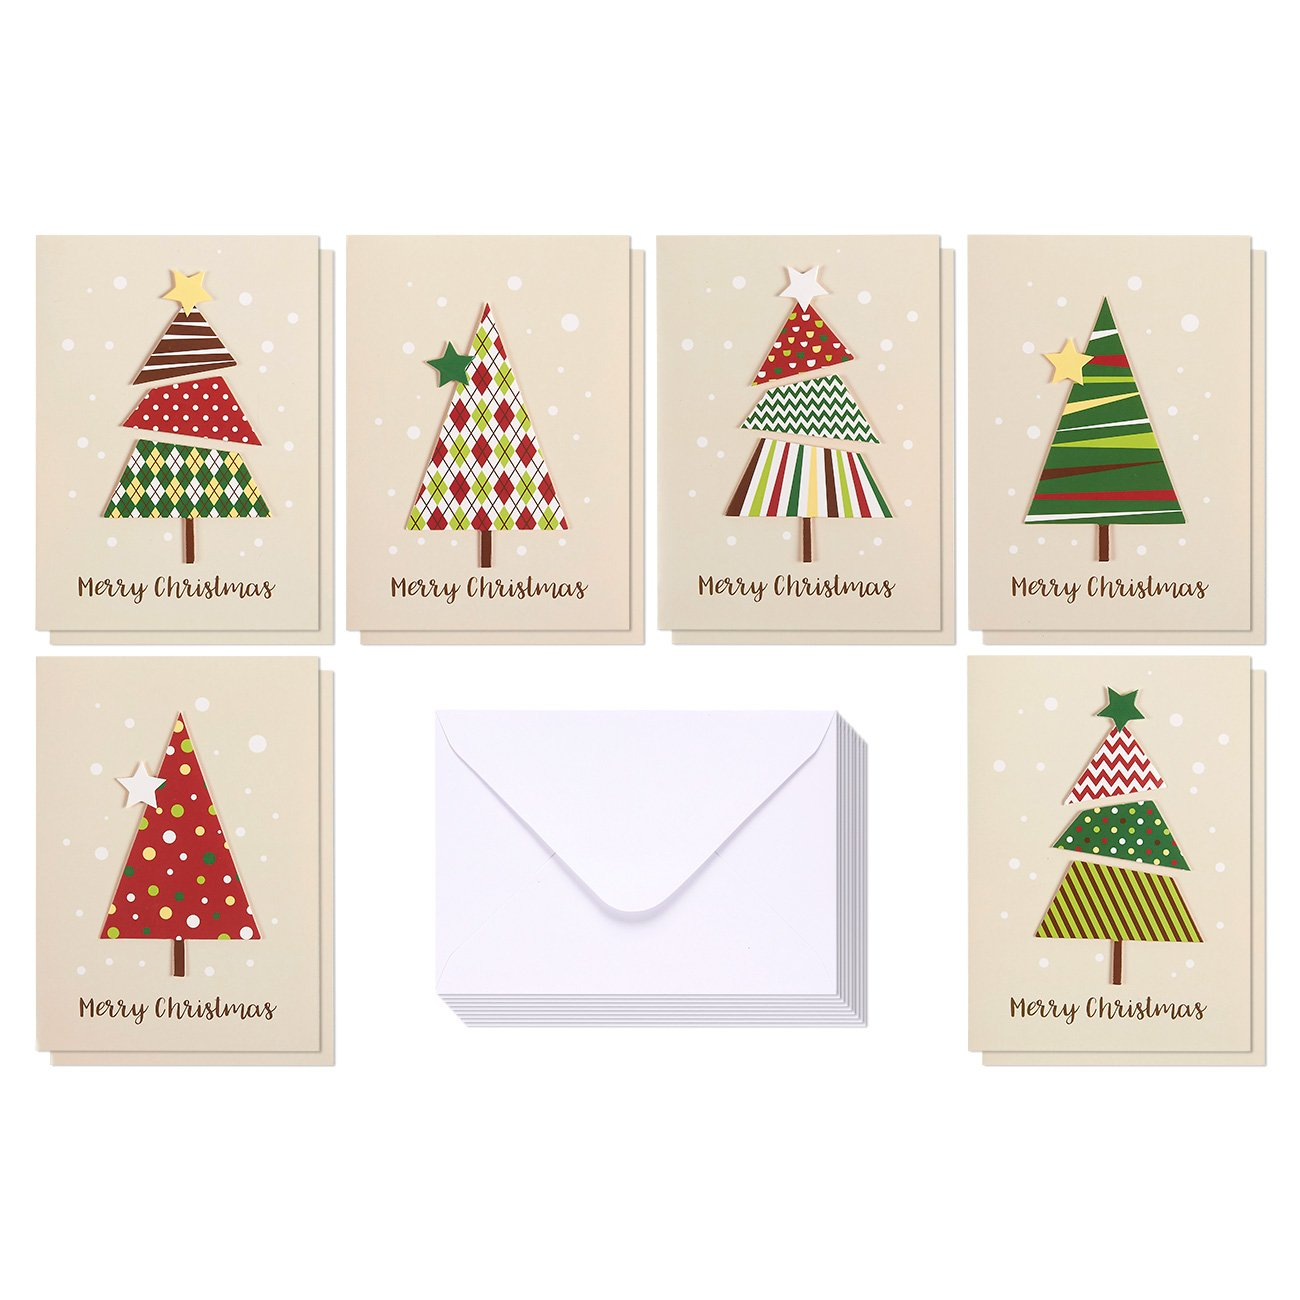 Amazon.com : Set of 12 Merry Christmas Greetings Cards - Handmade ...